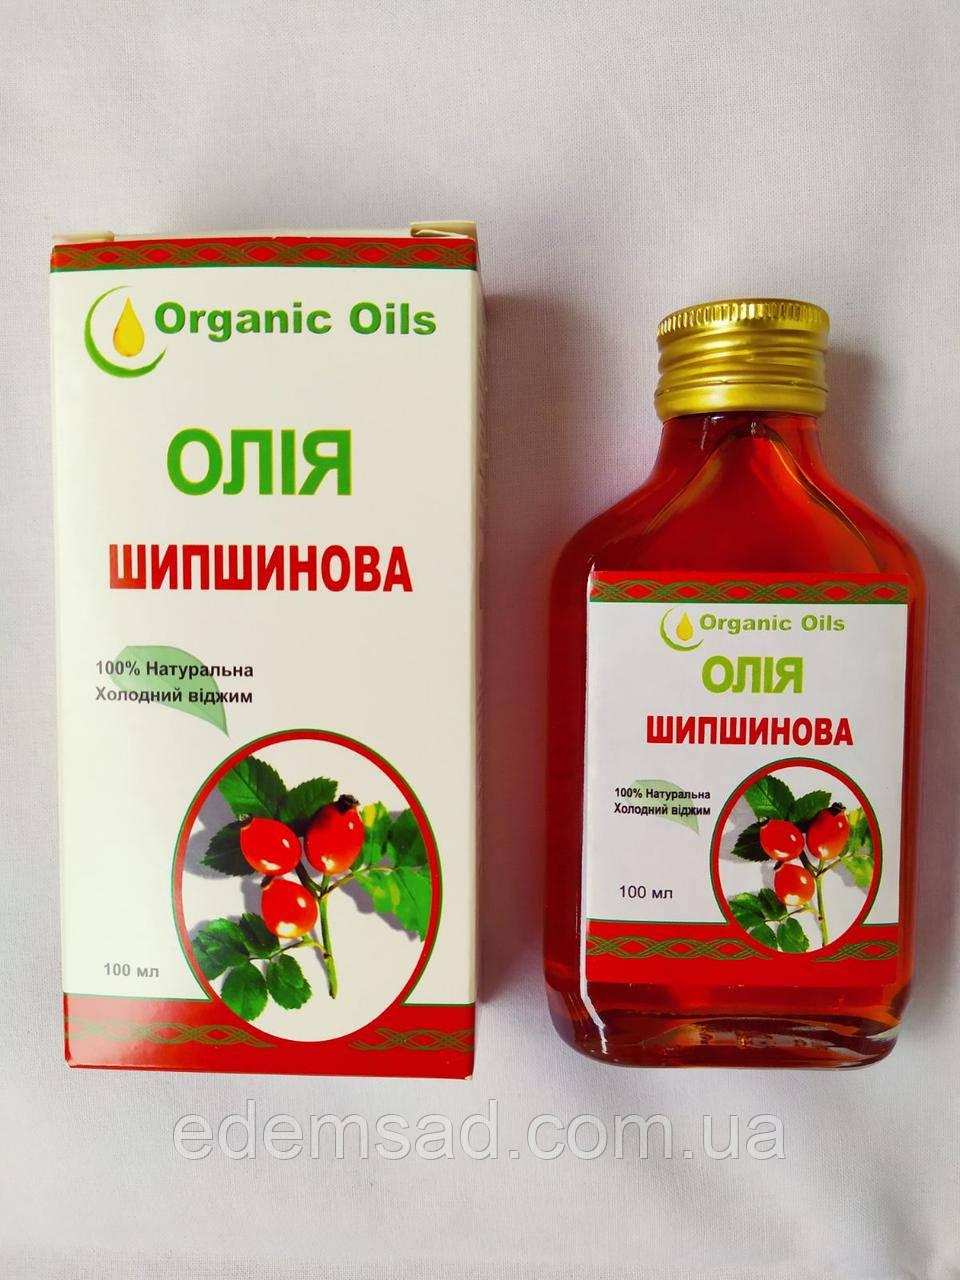 Олія шипшинова Organic Oils, 100 мл